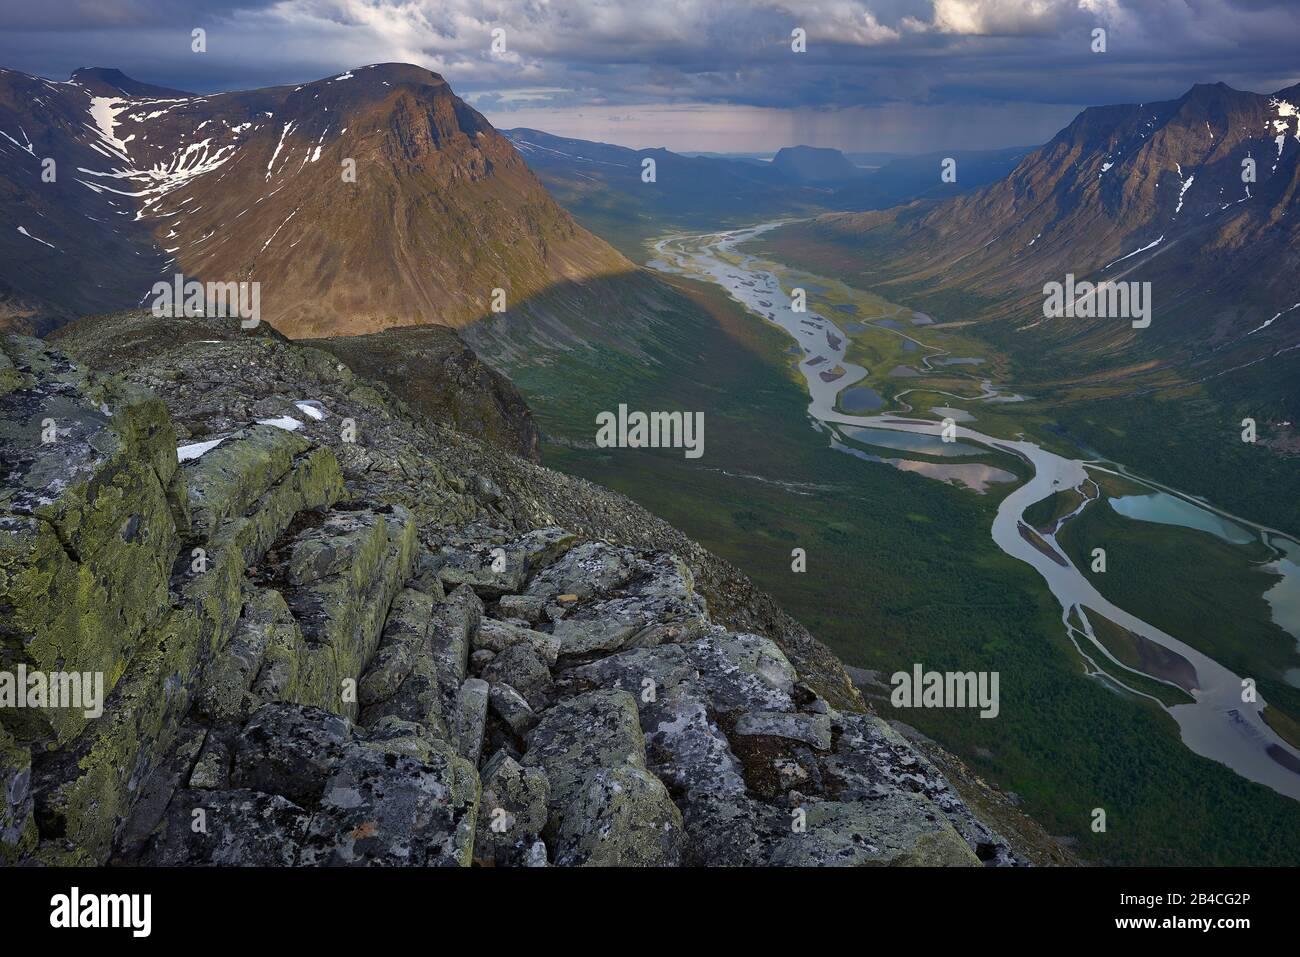 Sverige,Lappland,Sarek nationalpark, Rapaätno river toward mount Biellorieppe and Skoarki Stock Photo